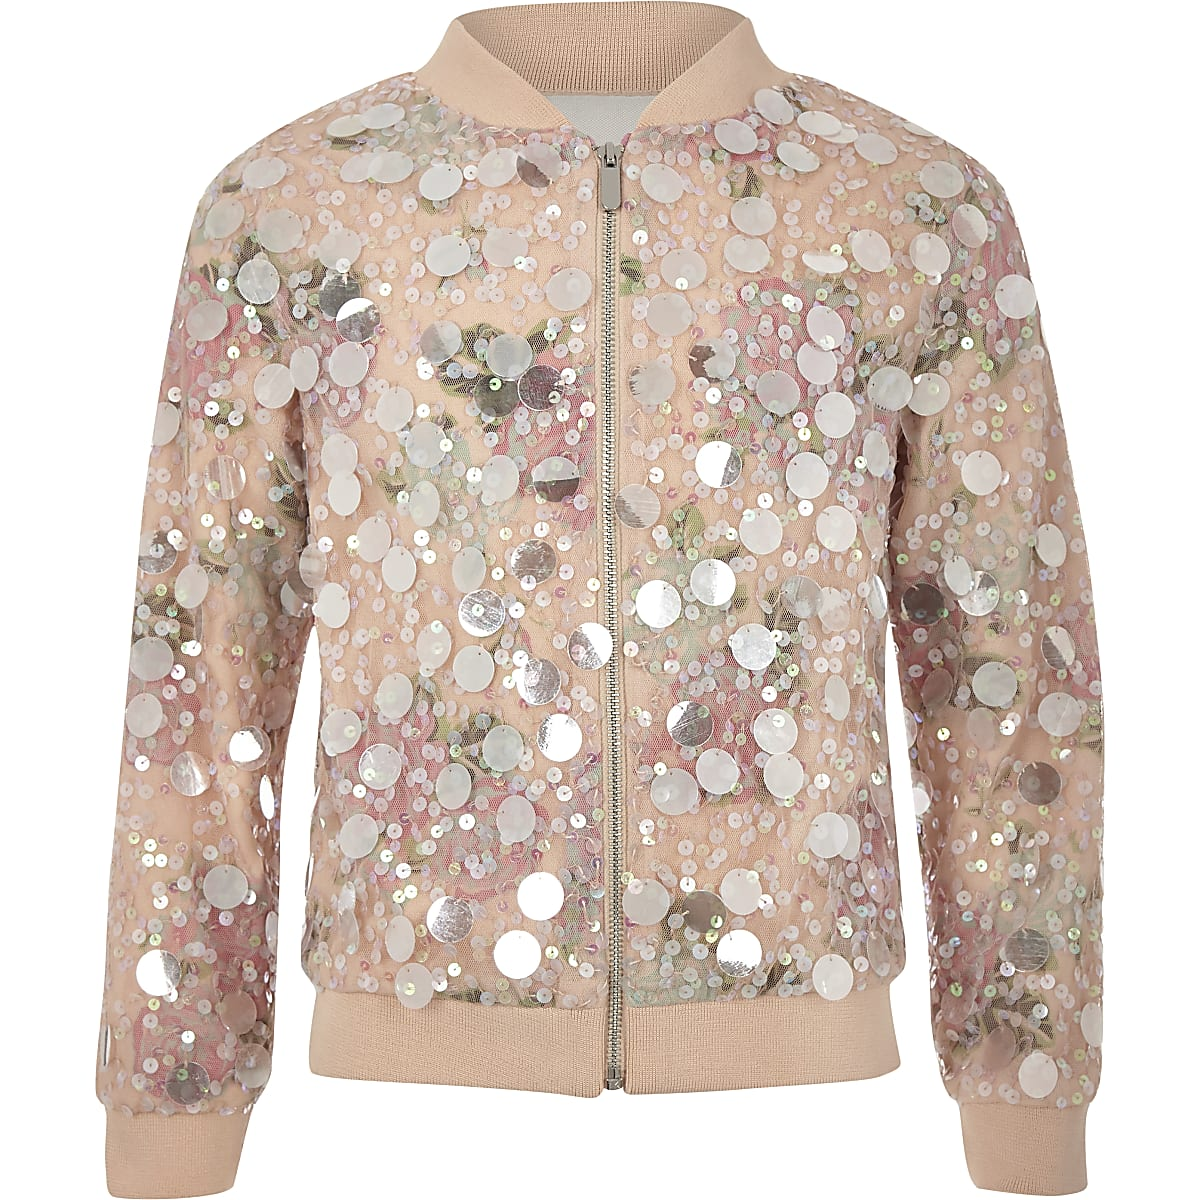 036193ea0 Girls pink sequin bomber jacket